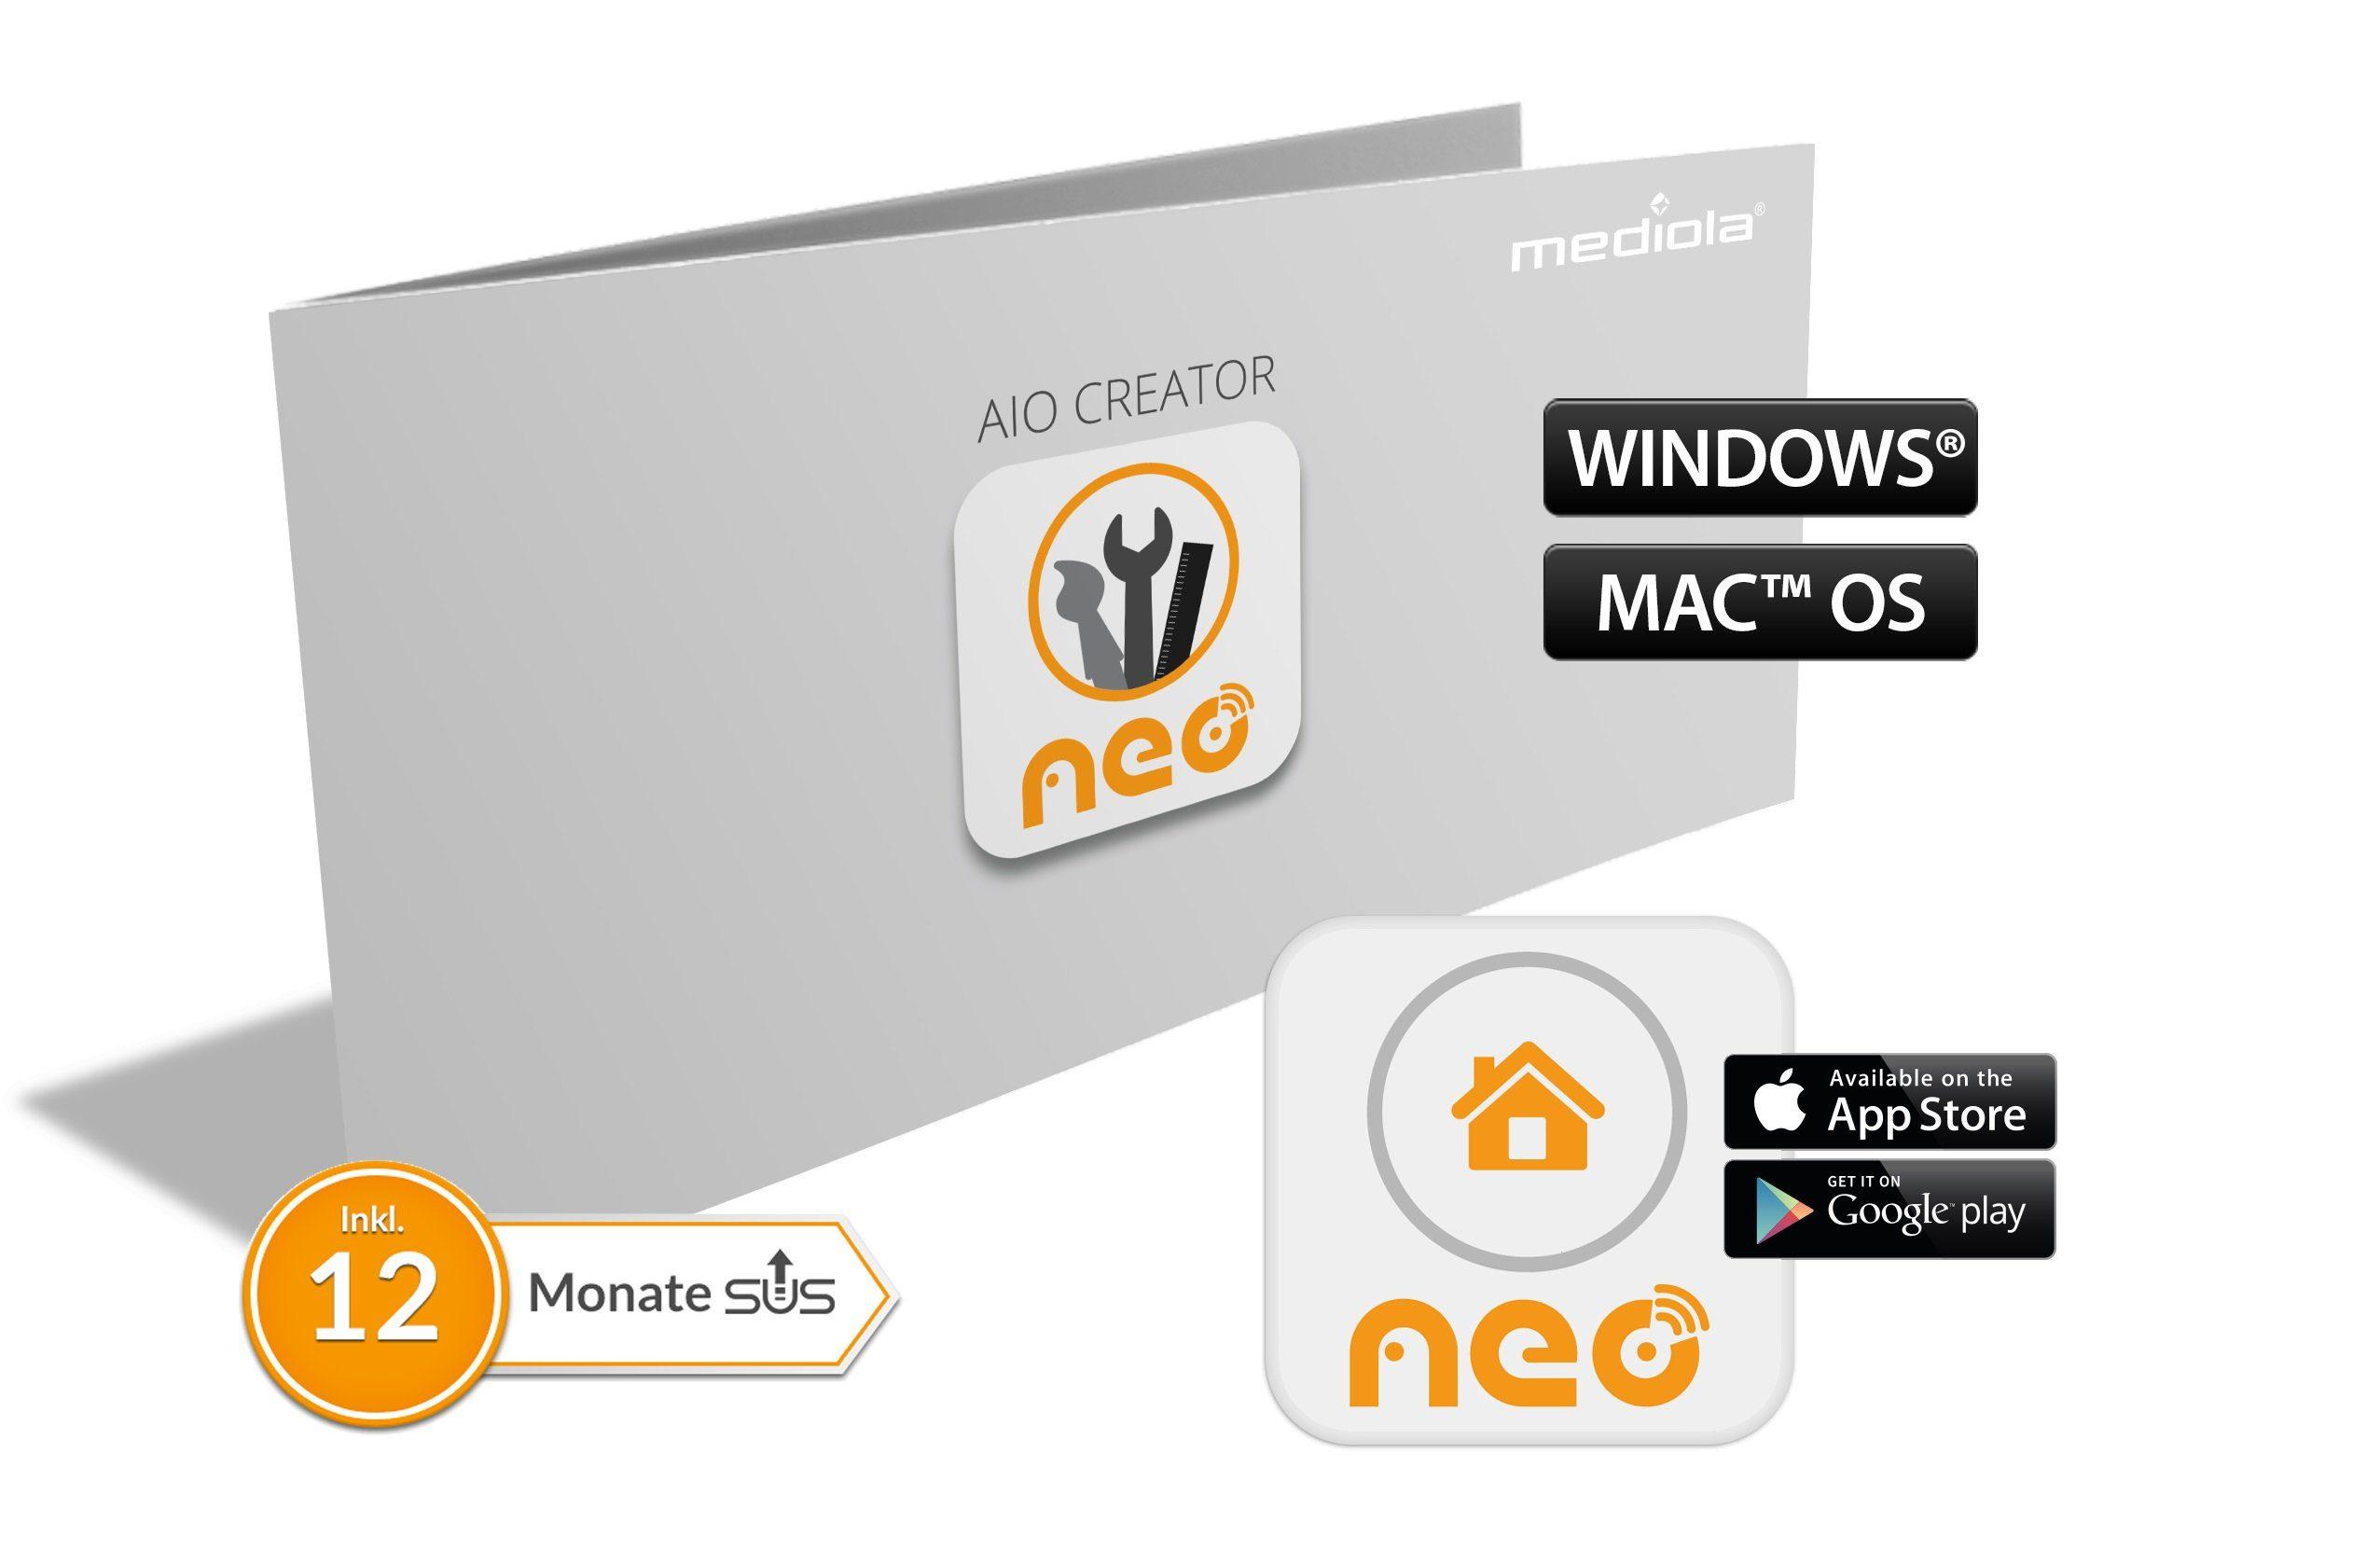 Mediola Smart Home - Steuerung & Komfort »AIO Creator NEO mediola® Edition«